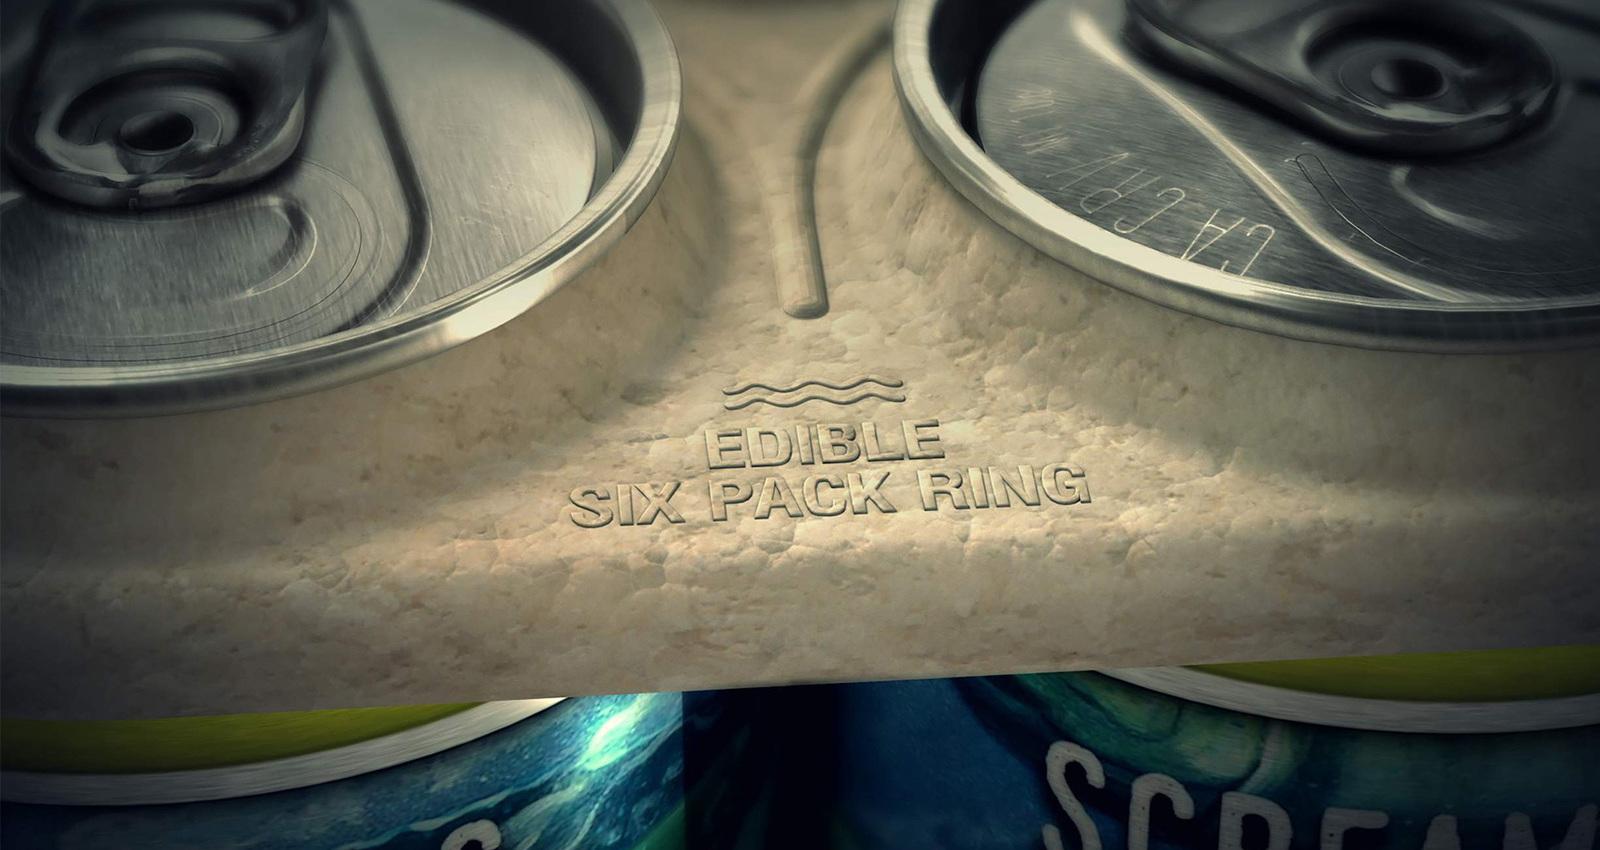 Edible Six Pack Rings